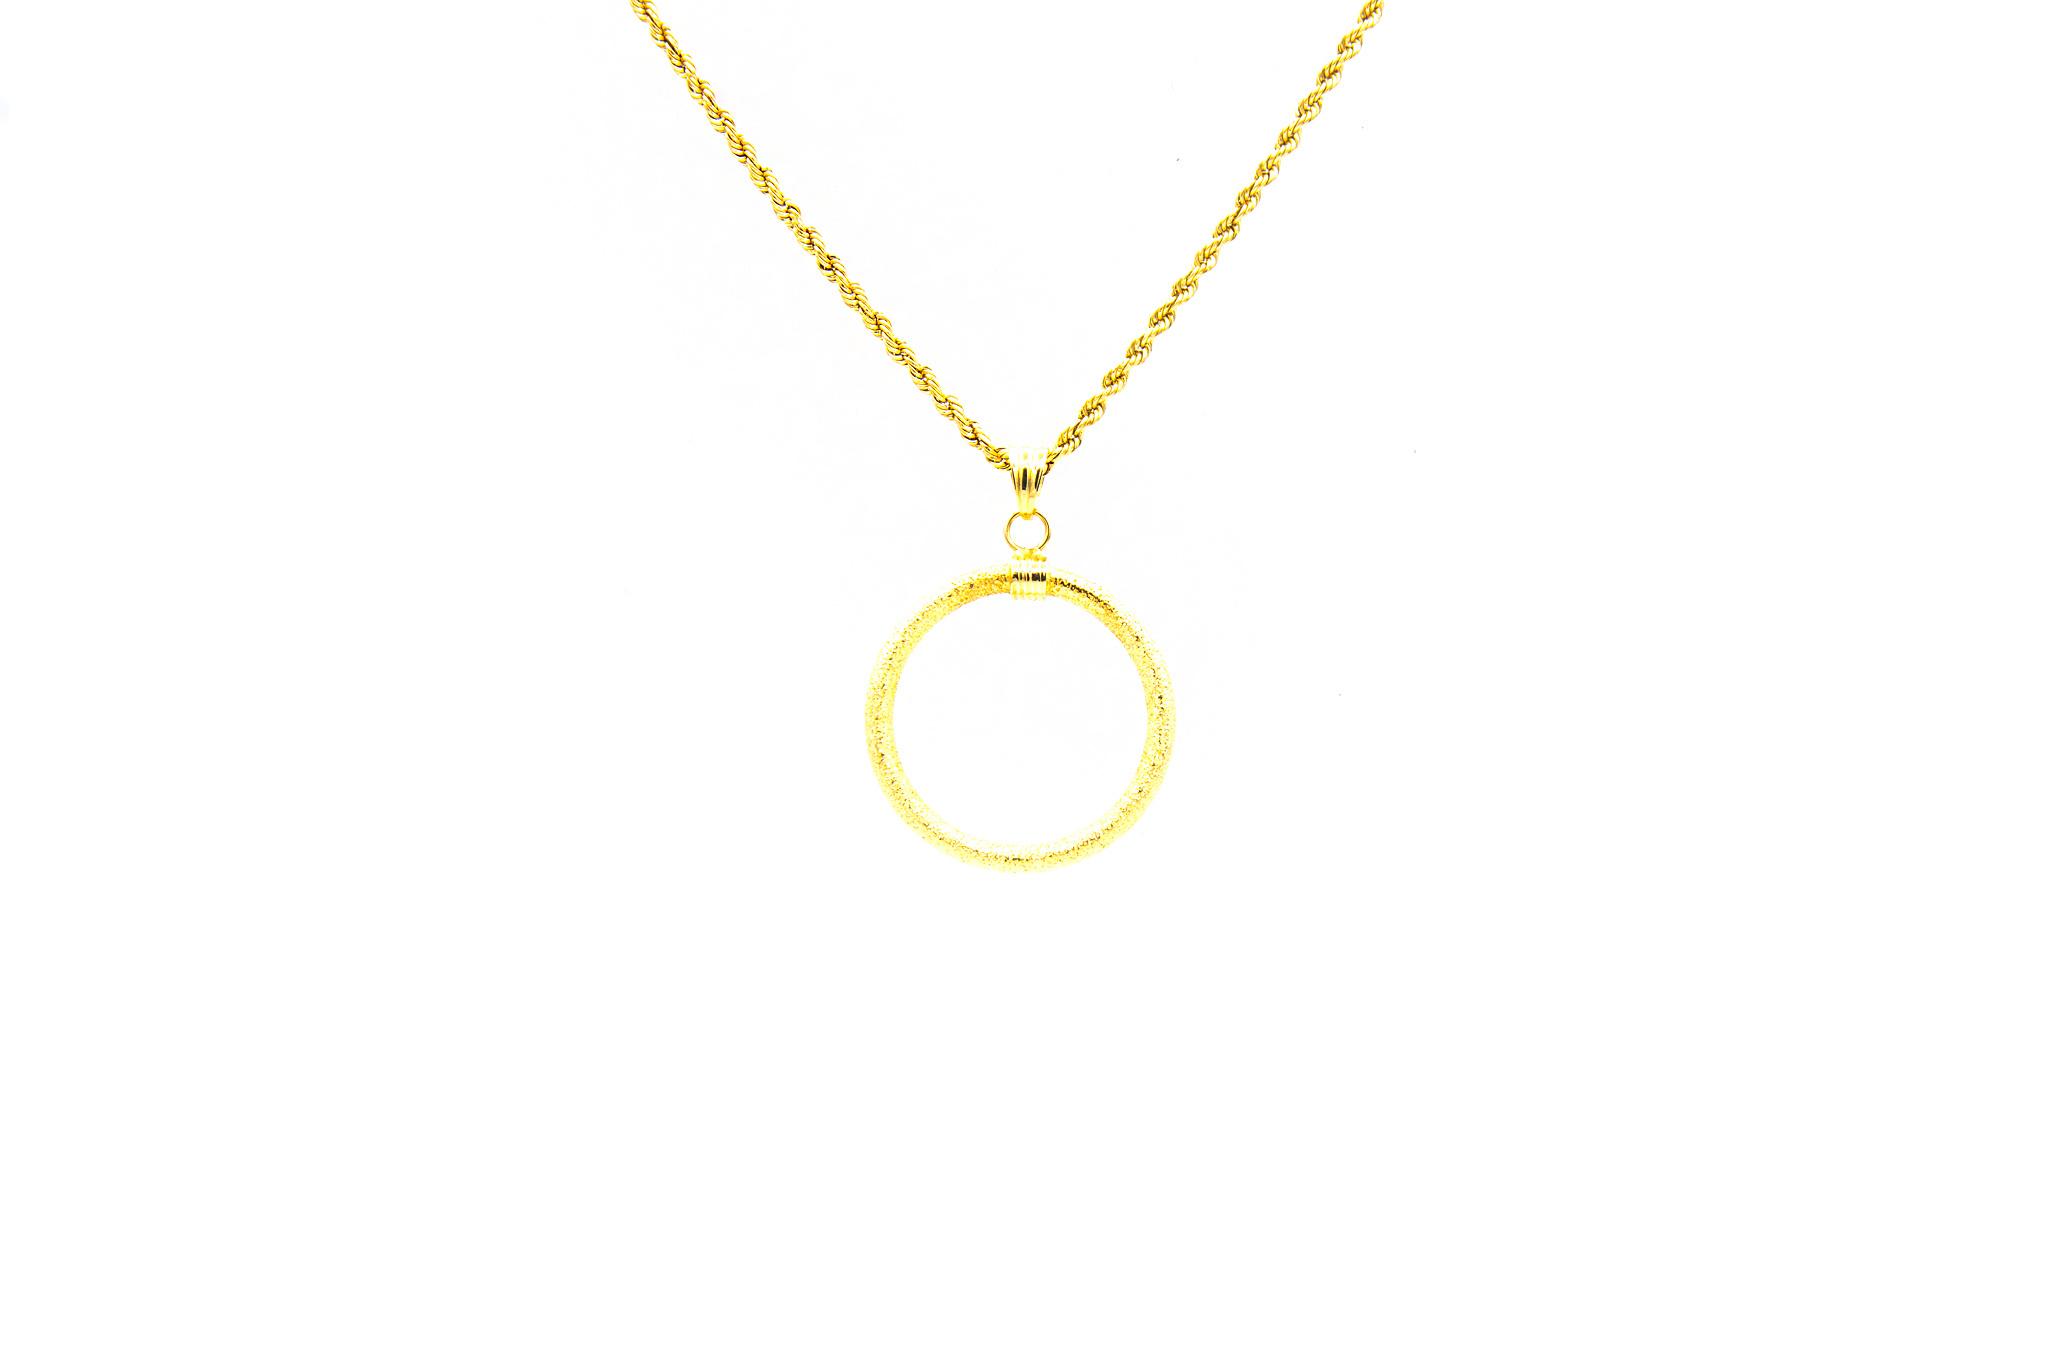 Hanger matte cirkel-1